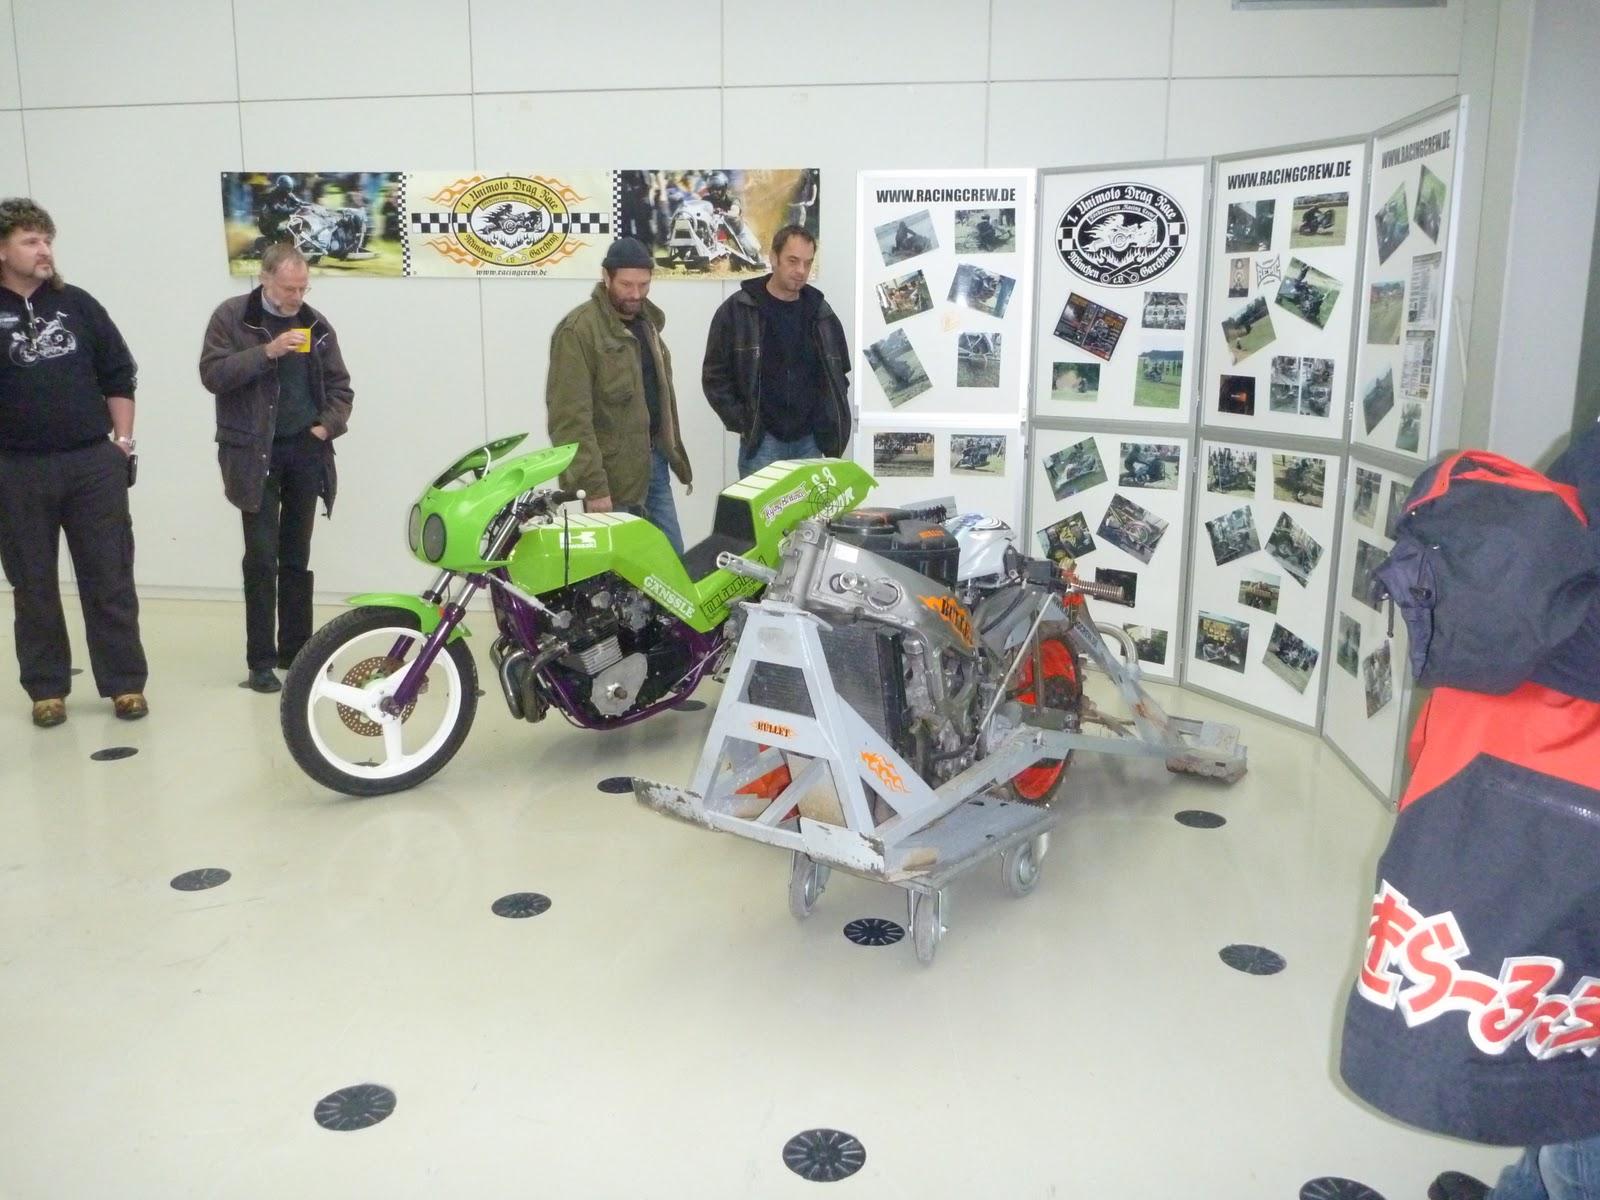 racing crew auf dem 19 m nchner motorrad teile markt. Black Bedroom Furniture Sets. Home Design Ideas